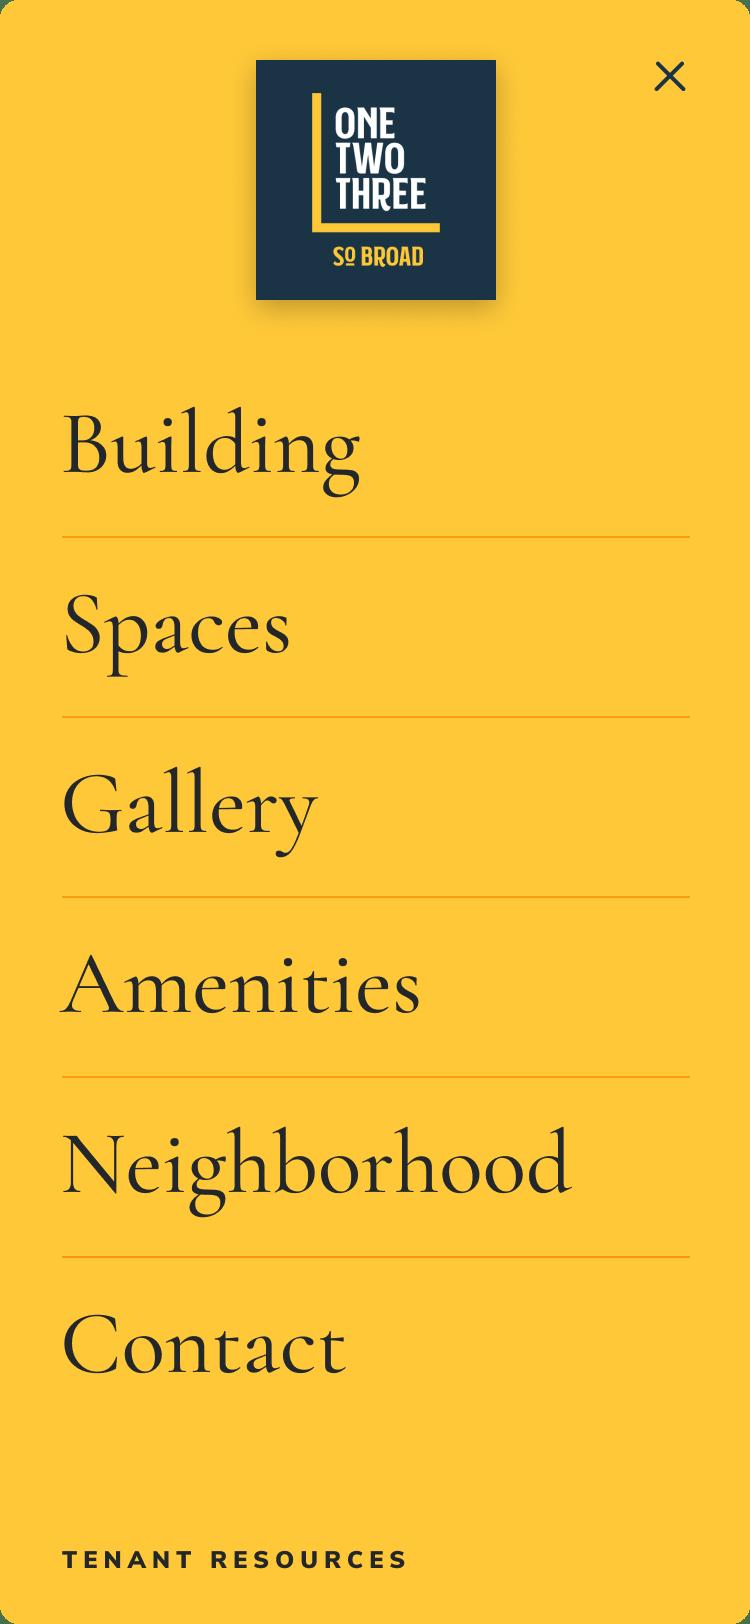 123 S Broad - Building, spaces gallery, amenities, neighborhood, contact, tenant resources